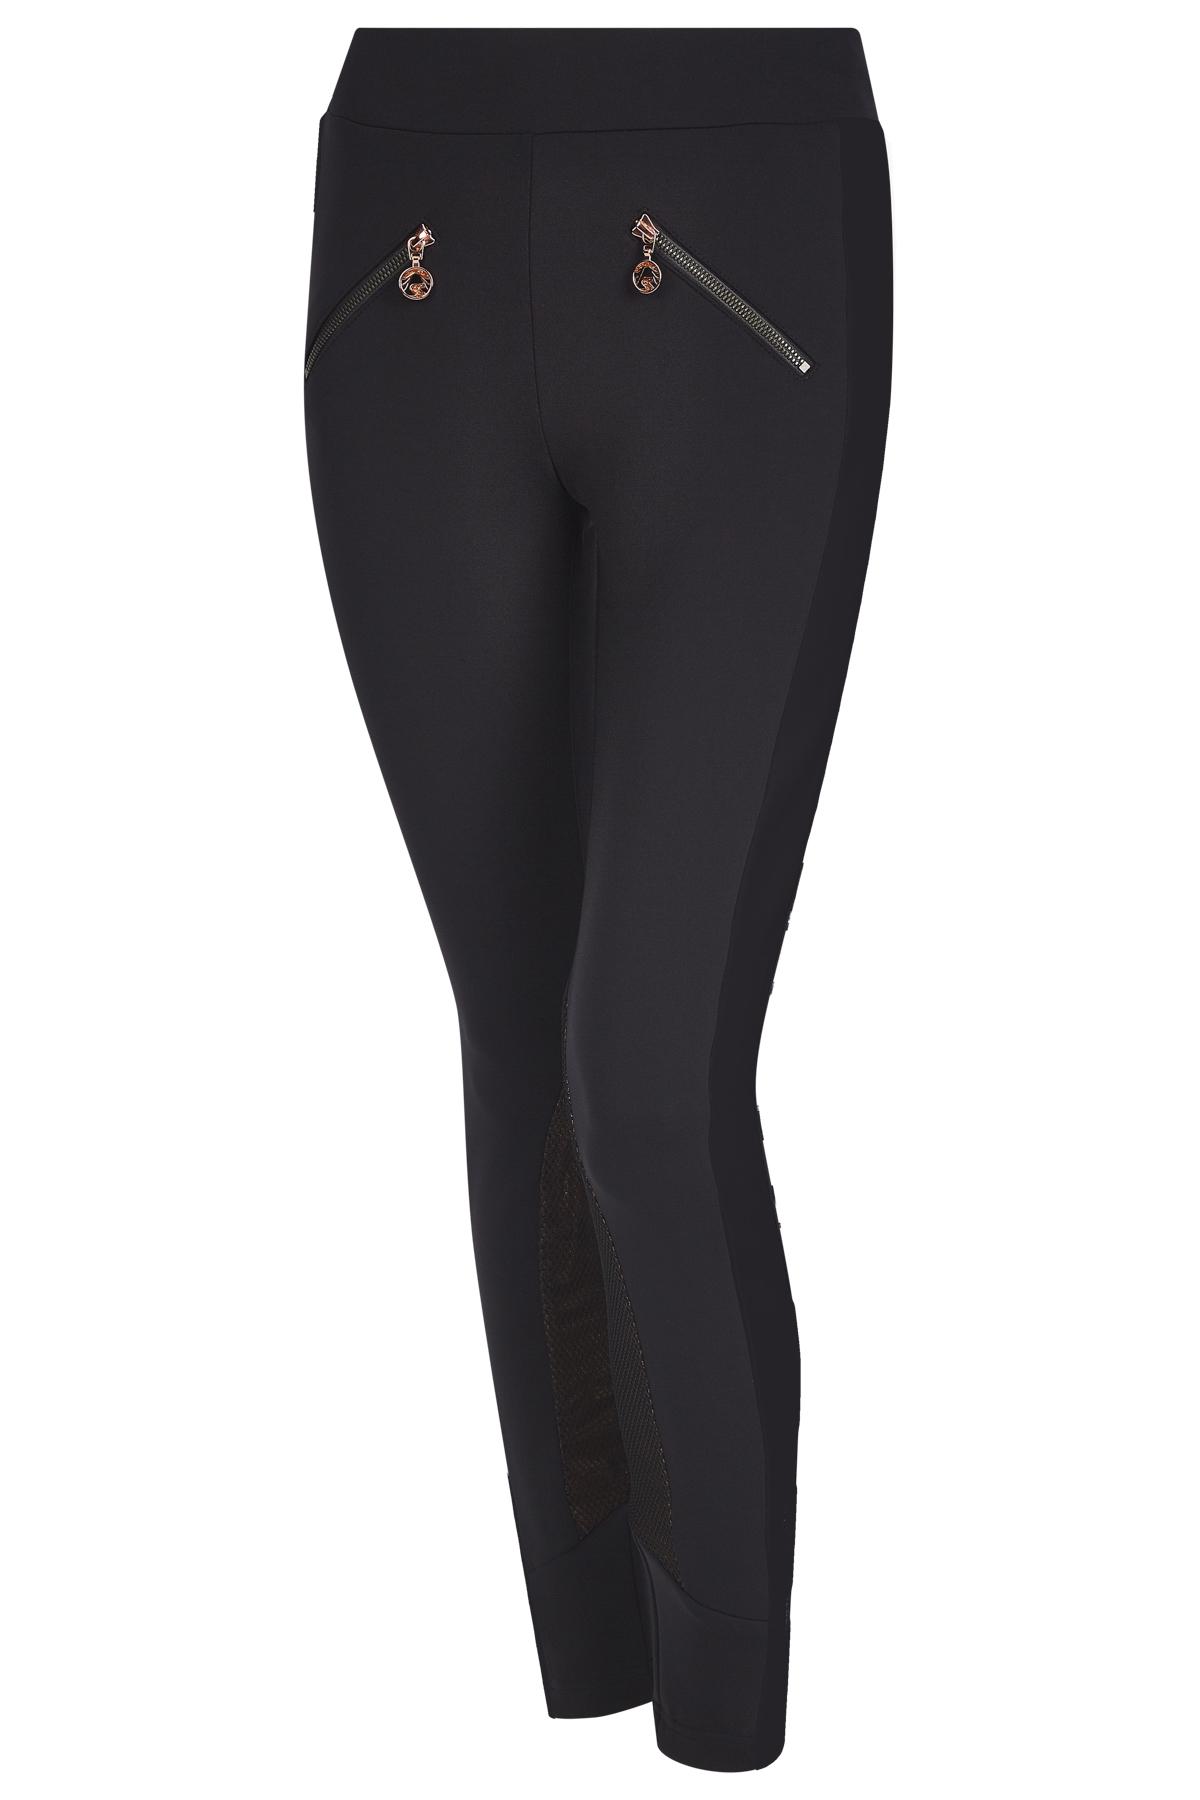 Sportalm Figurbetonte Hose in Stretch-Qualität